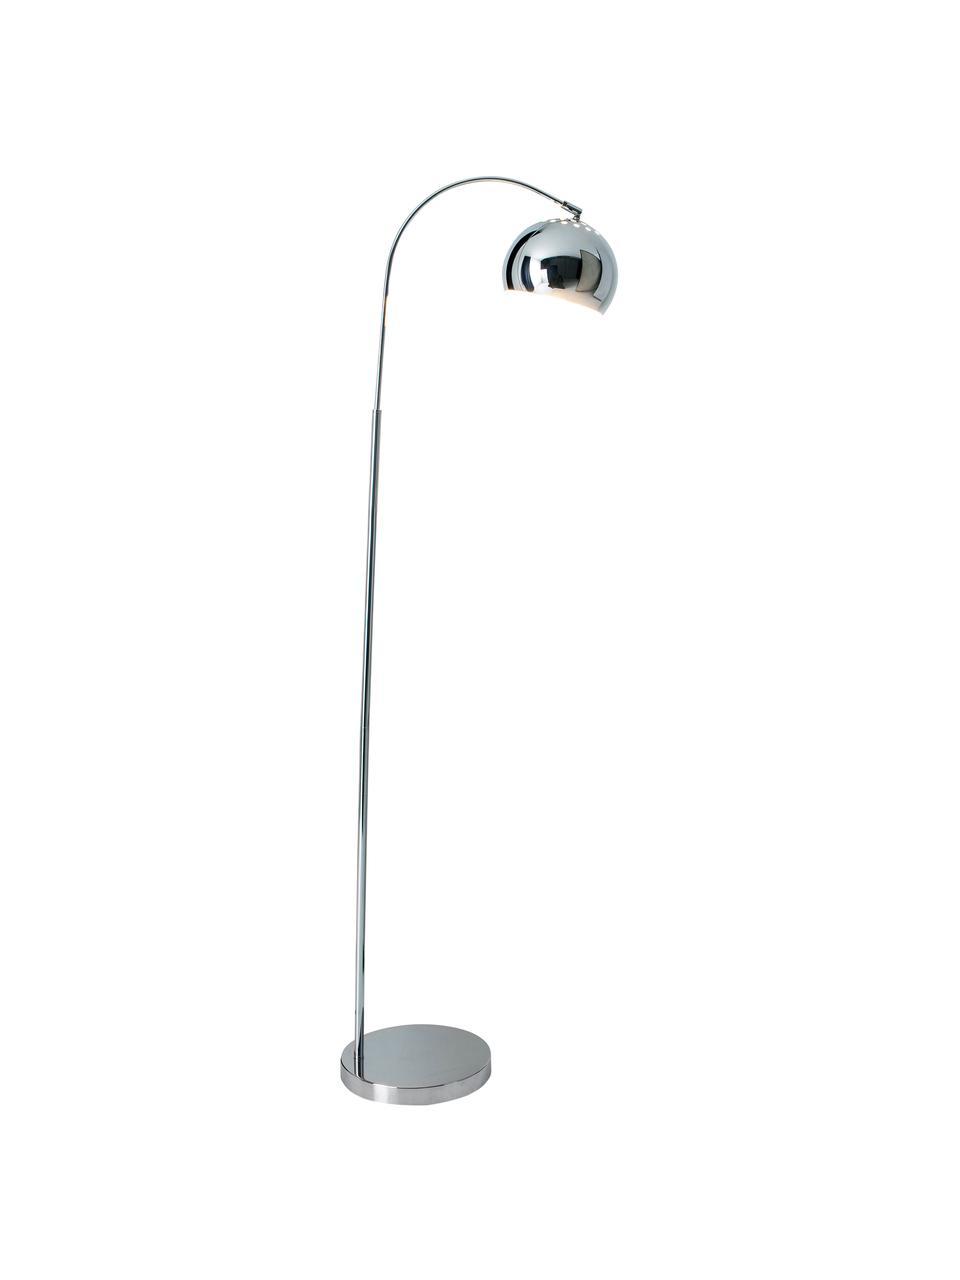 Leselampe Style in Silber, Lampenschirm: Metall, Lampenfuß: Metall, Silberfarben, T 45 x H 146 cm